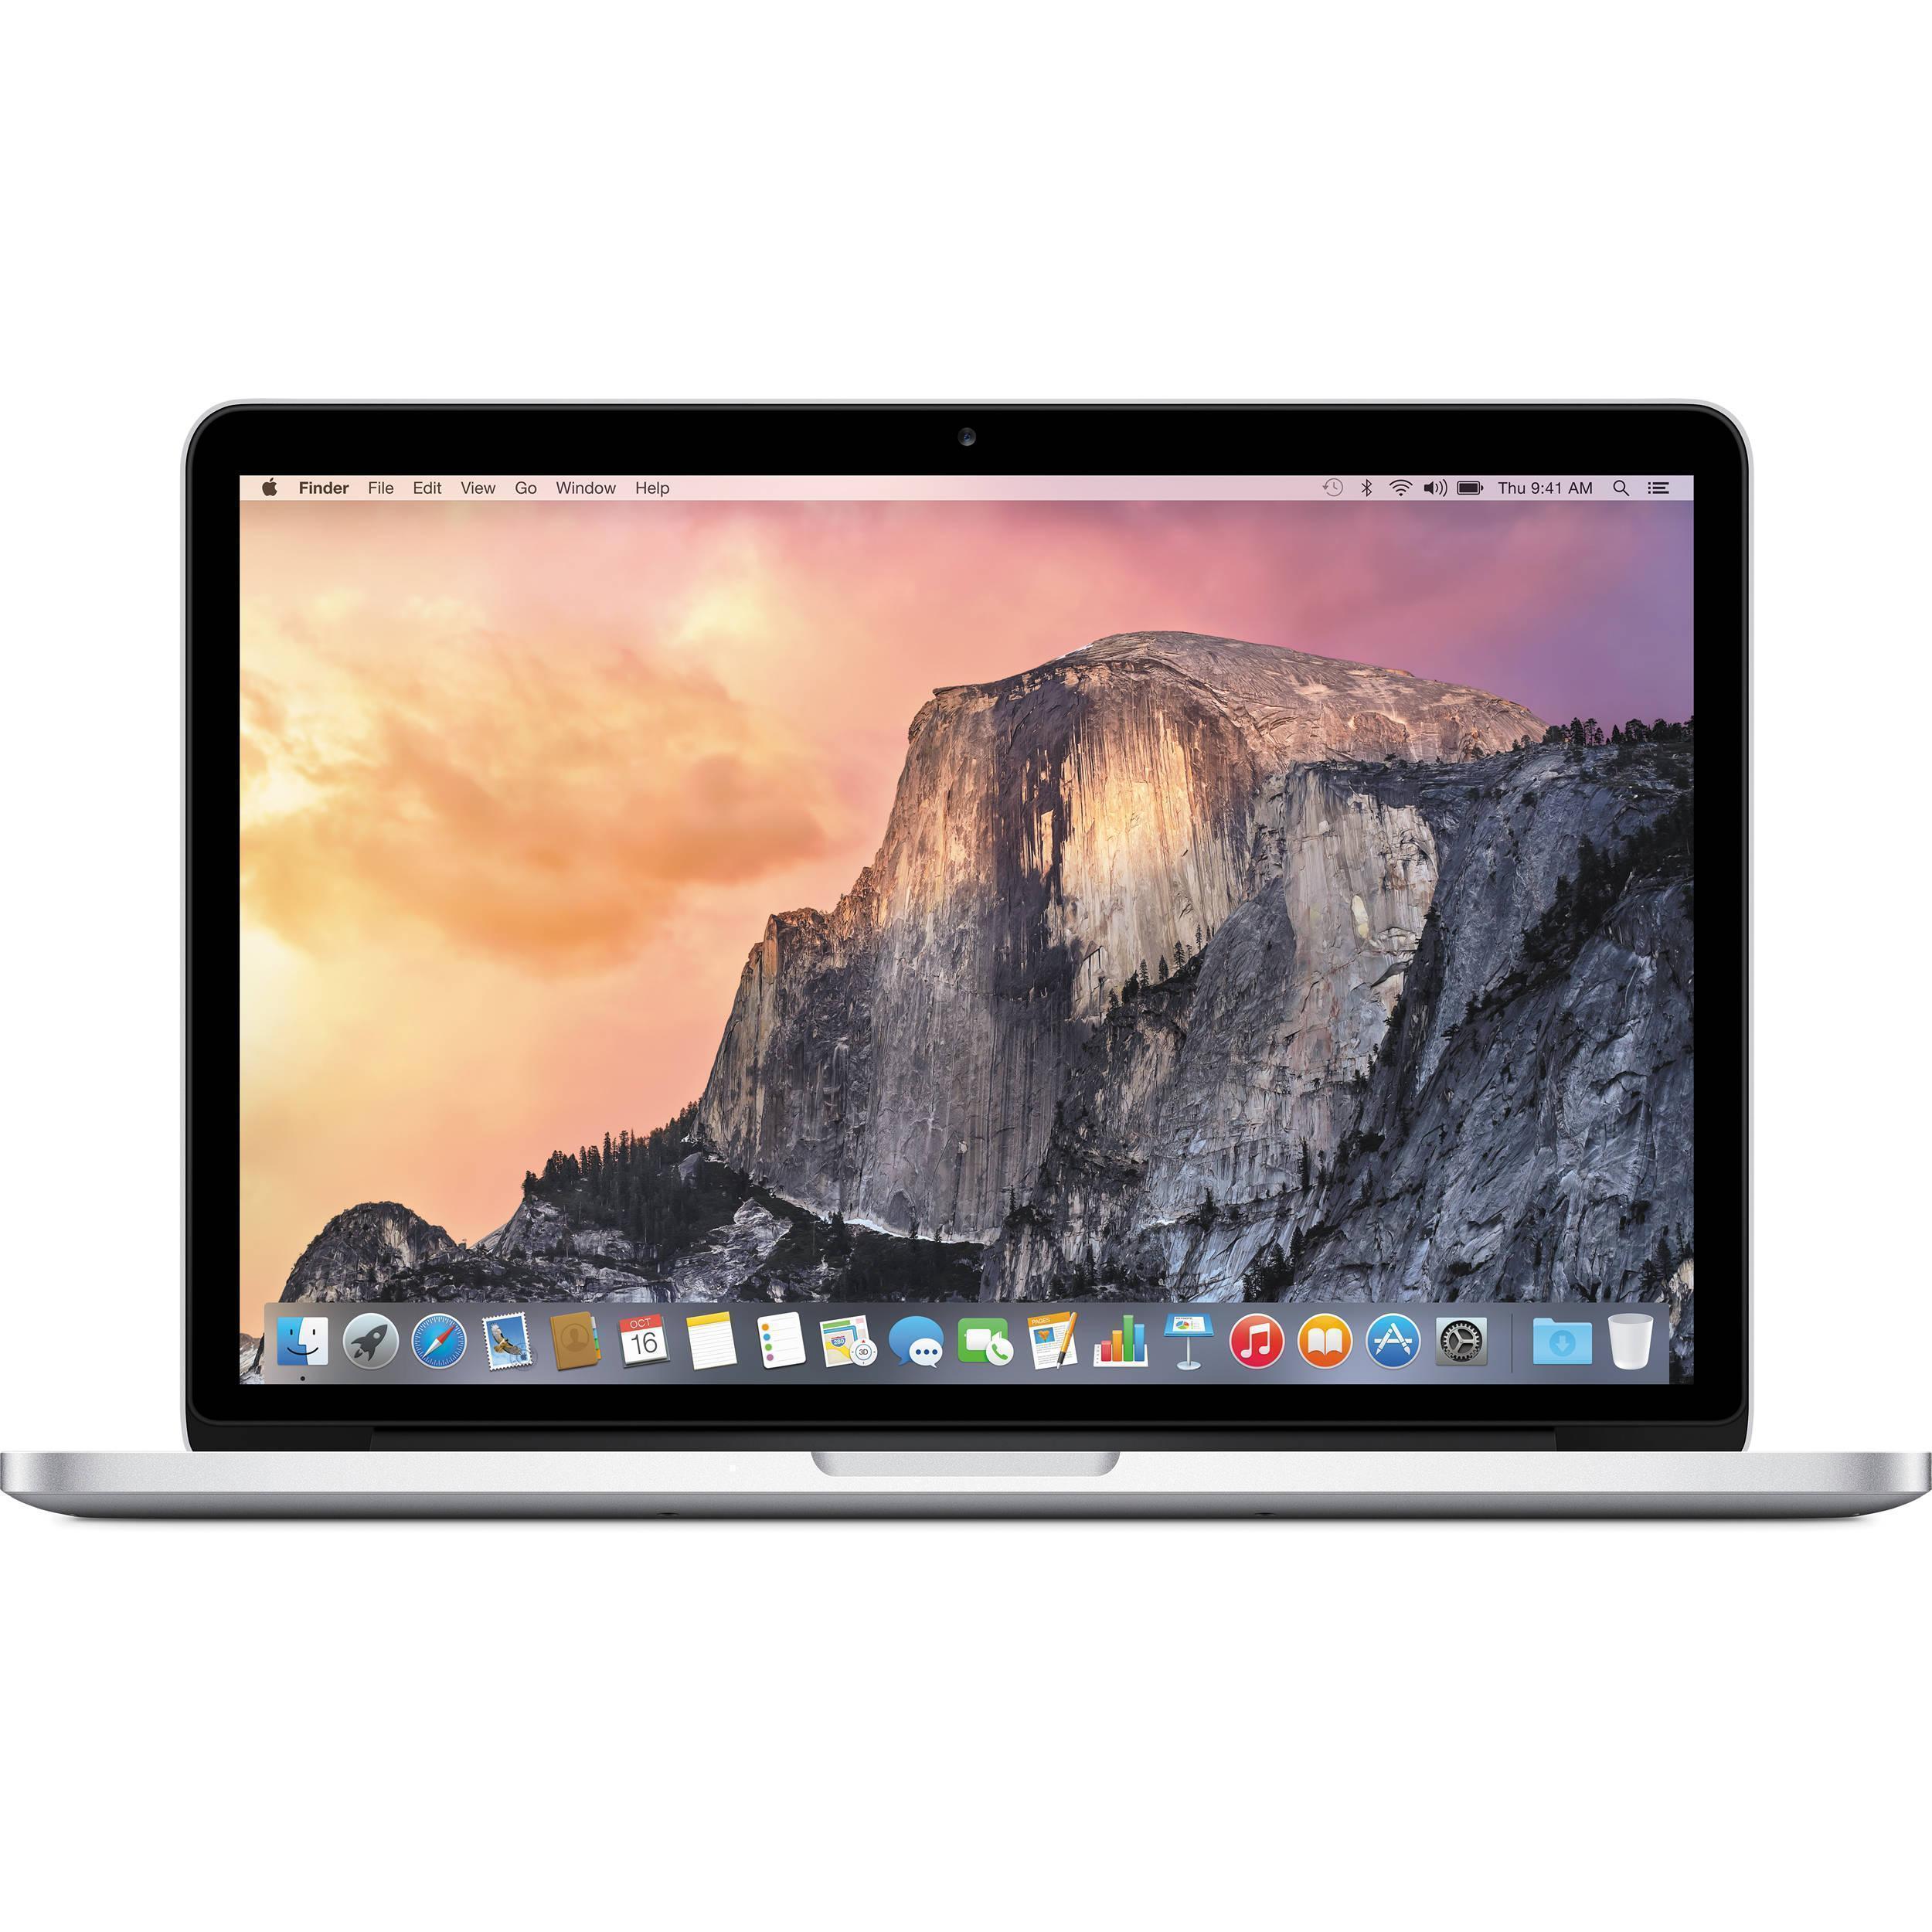 "MacBook Pro 13"" Retina (2015) - Core i7 3,1 GHz - SSD 1000 GB - 16GB - QWERTY - Arabisch"